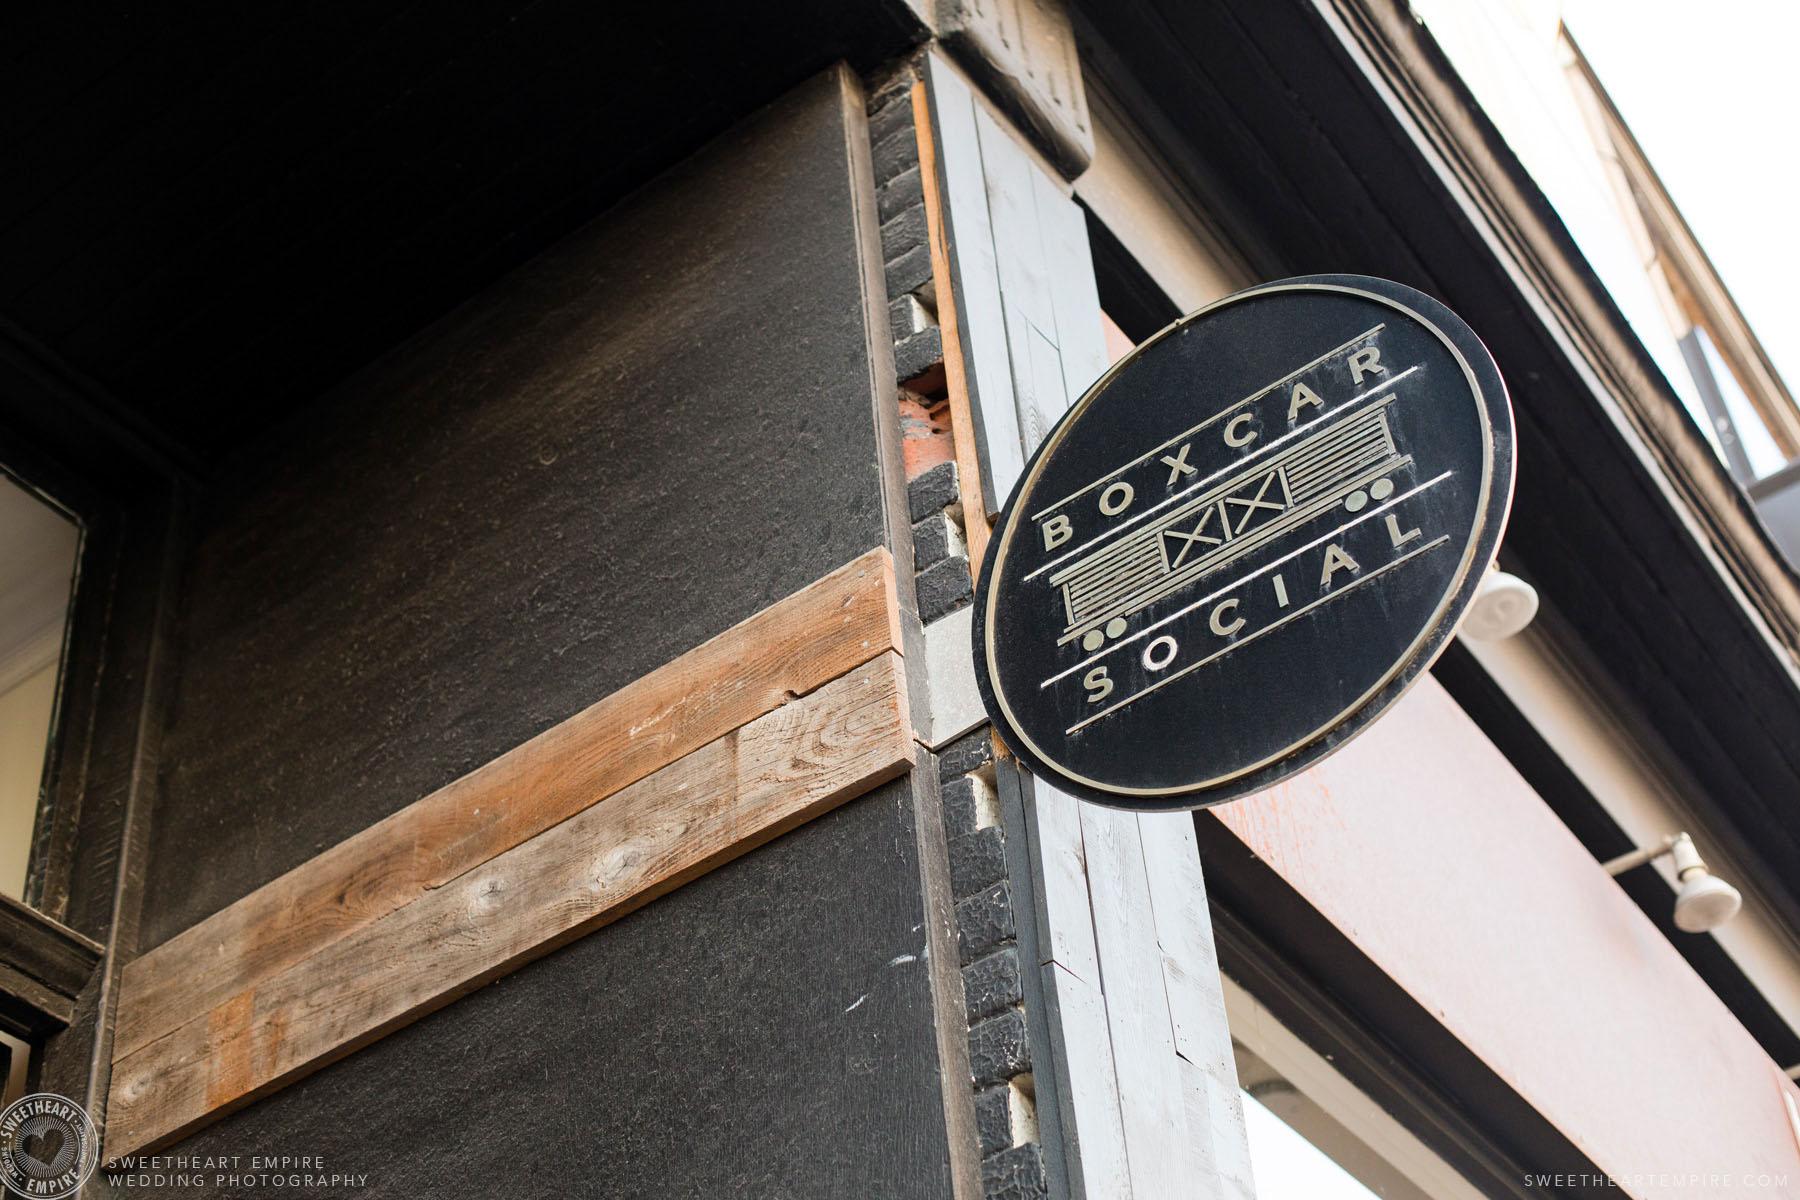 11_Boxcar-Social-Cafe-Engagement-Photos